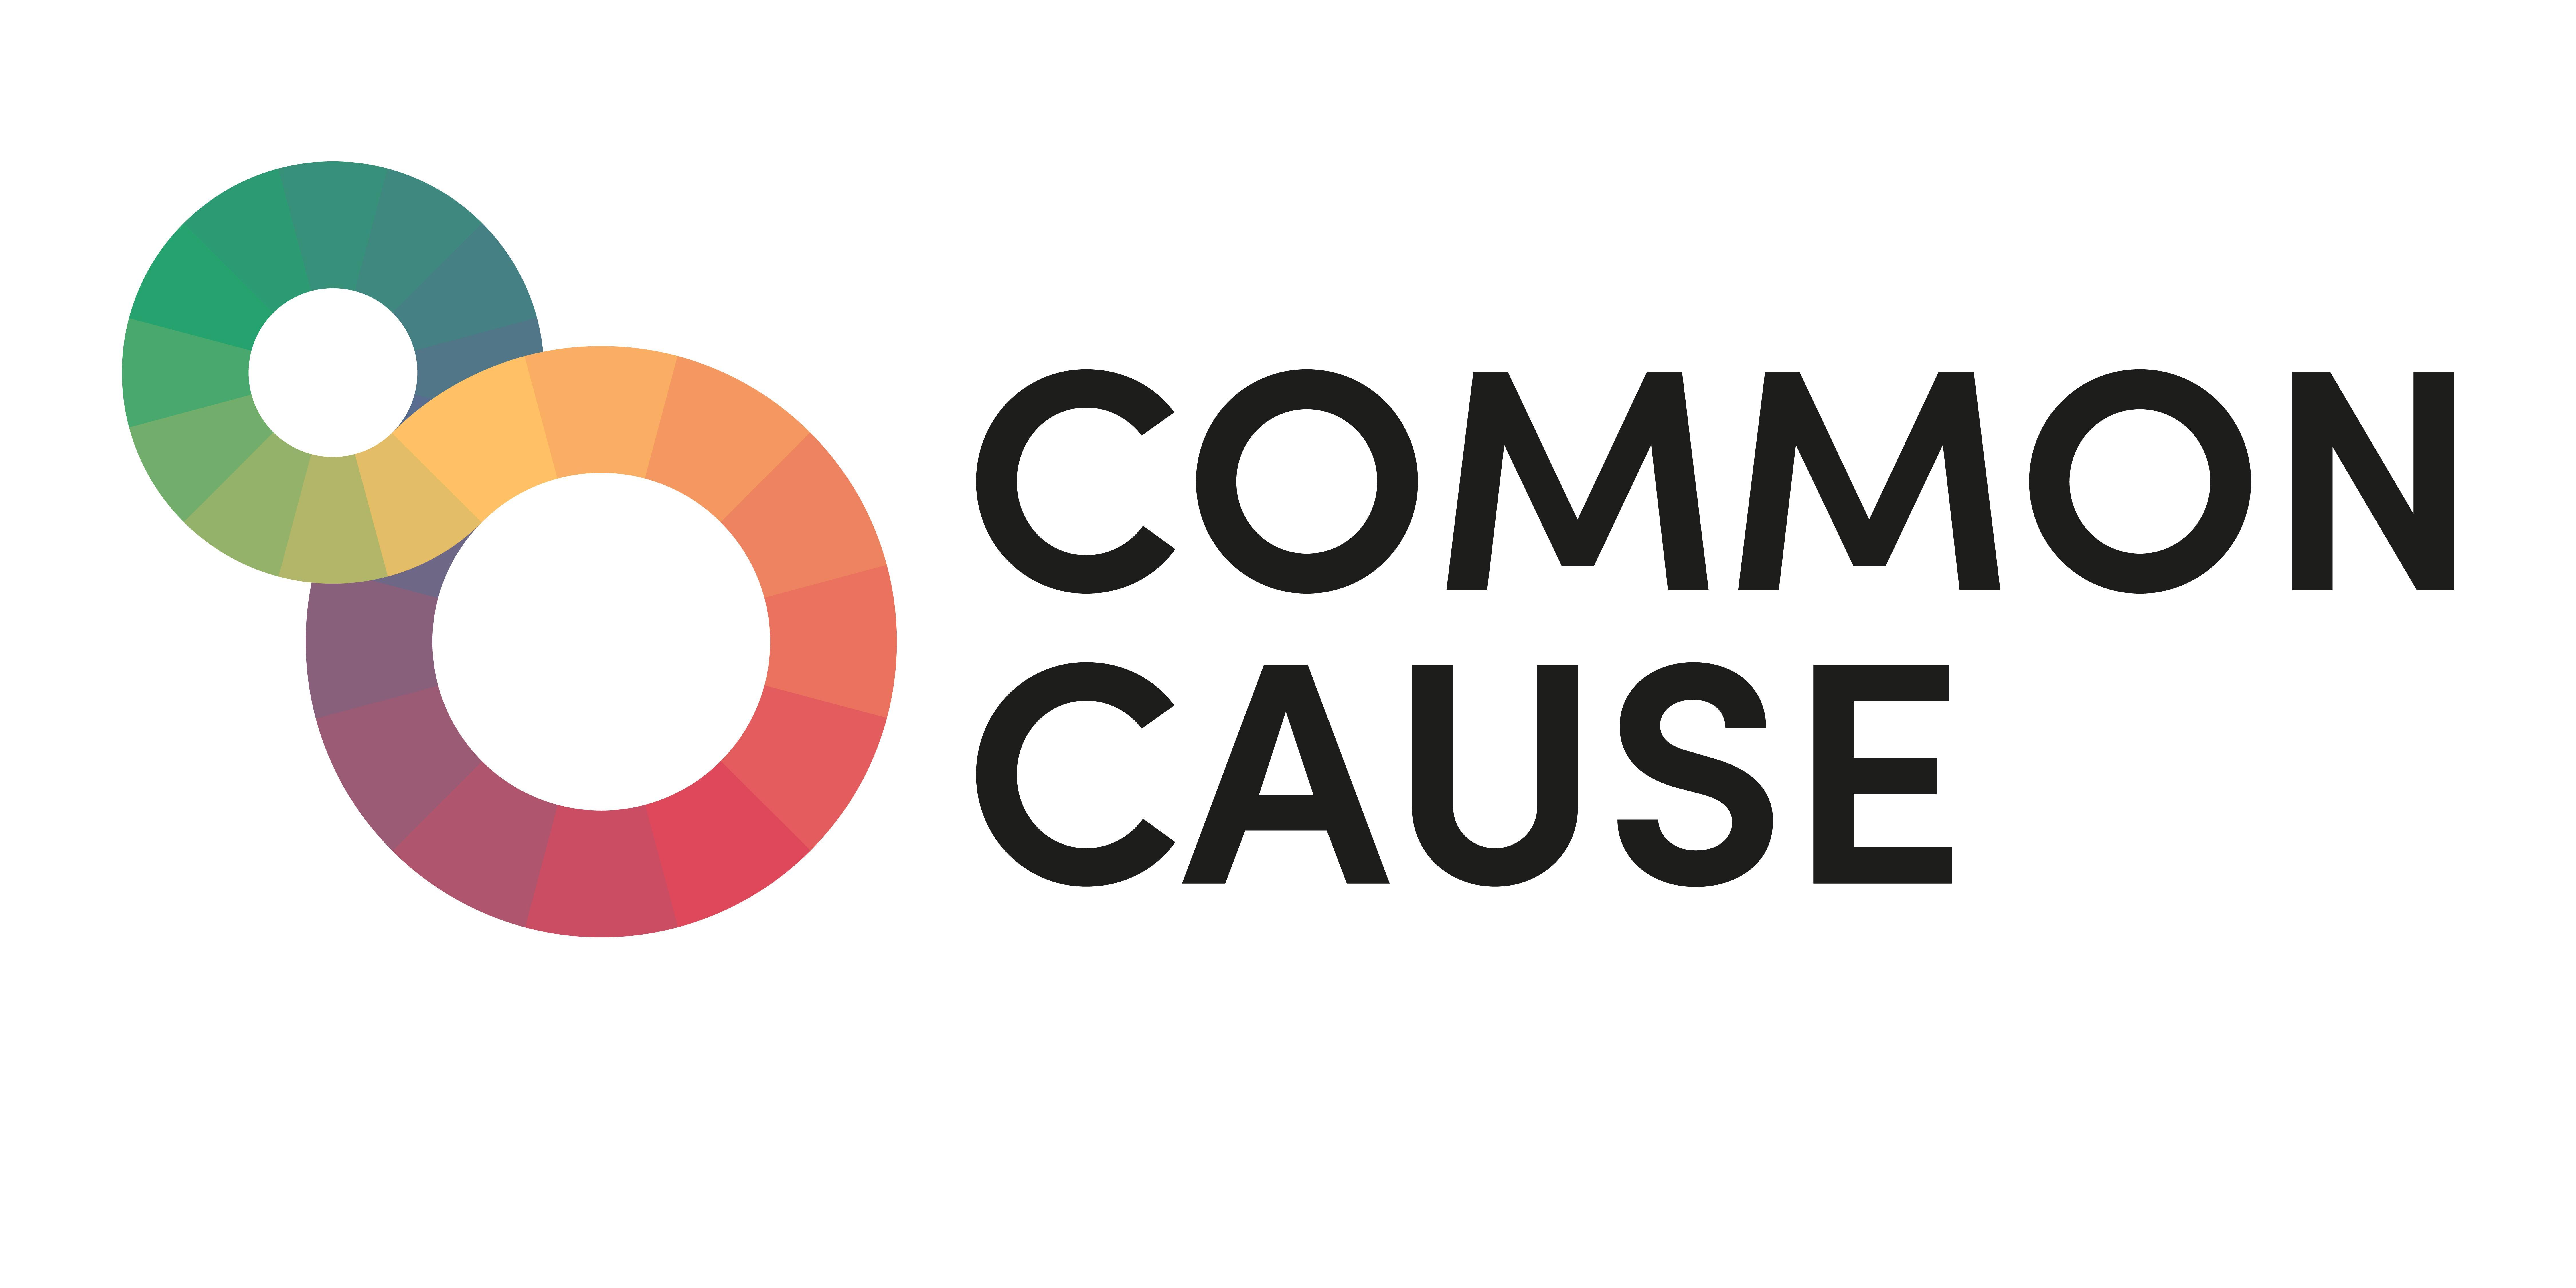 Common Cause - London